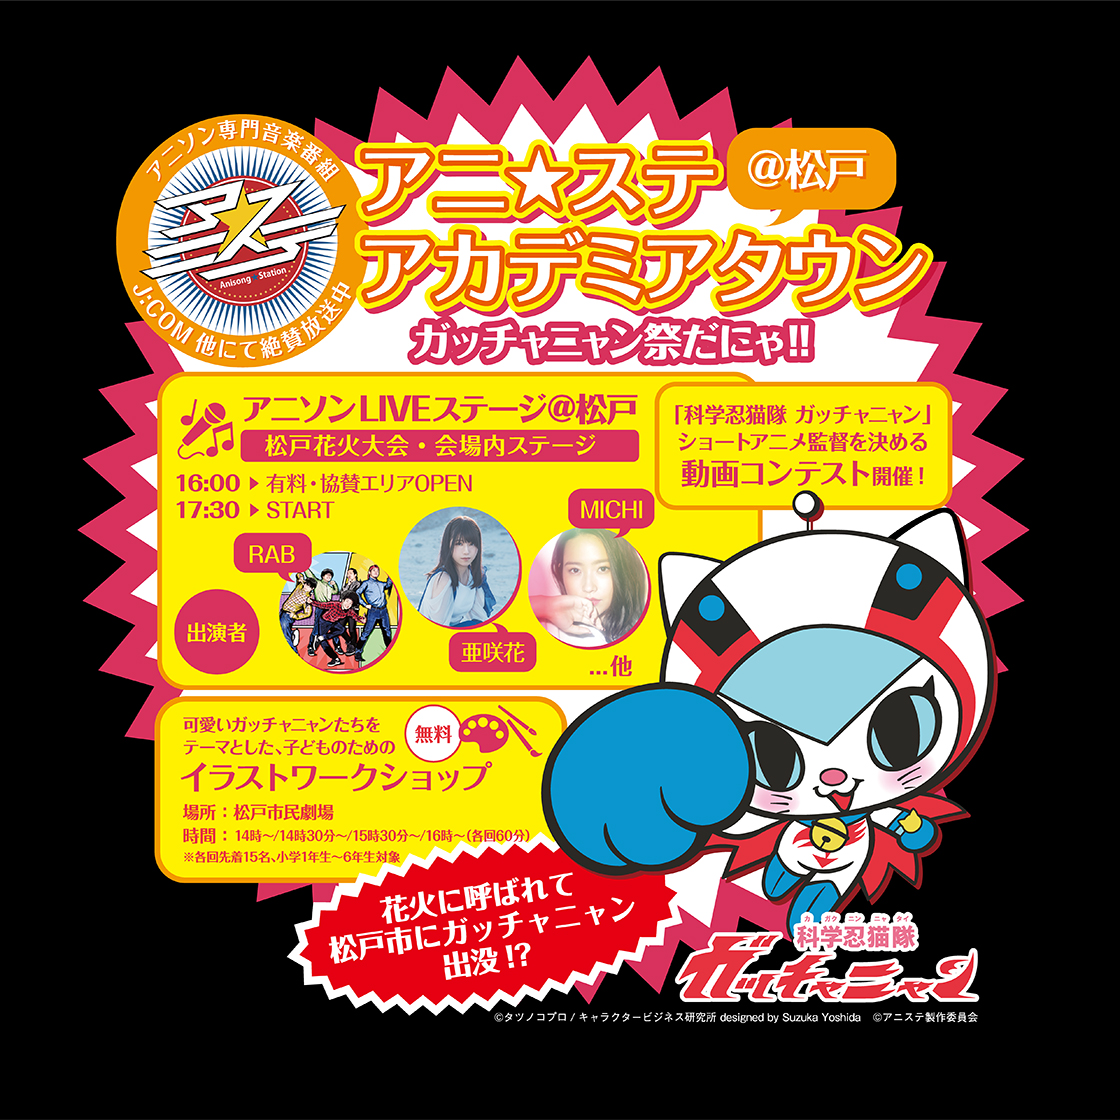 Funs Project 放送局 ニュースfuns Project